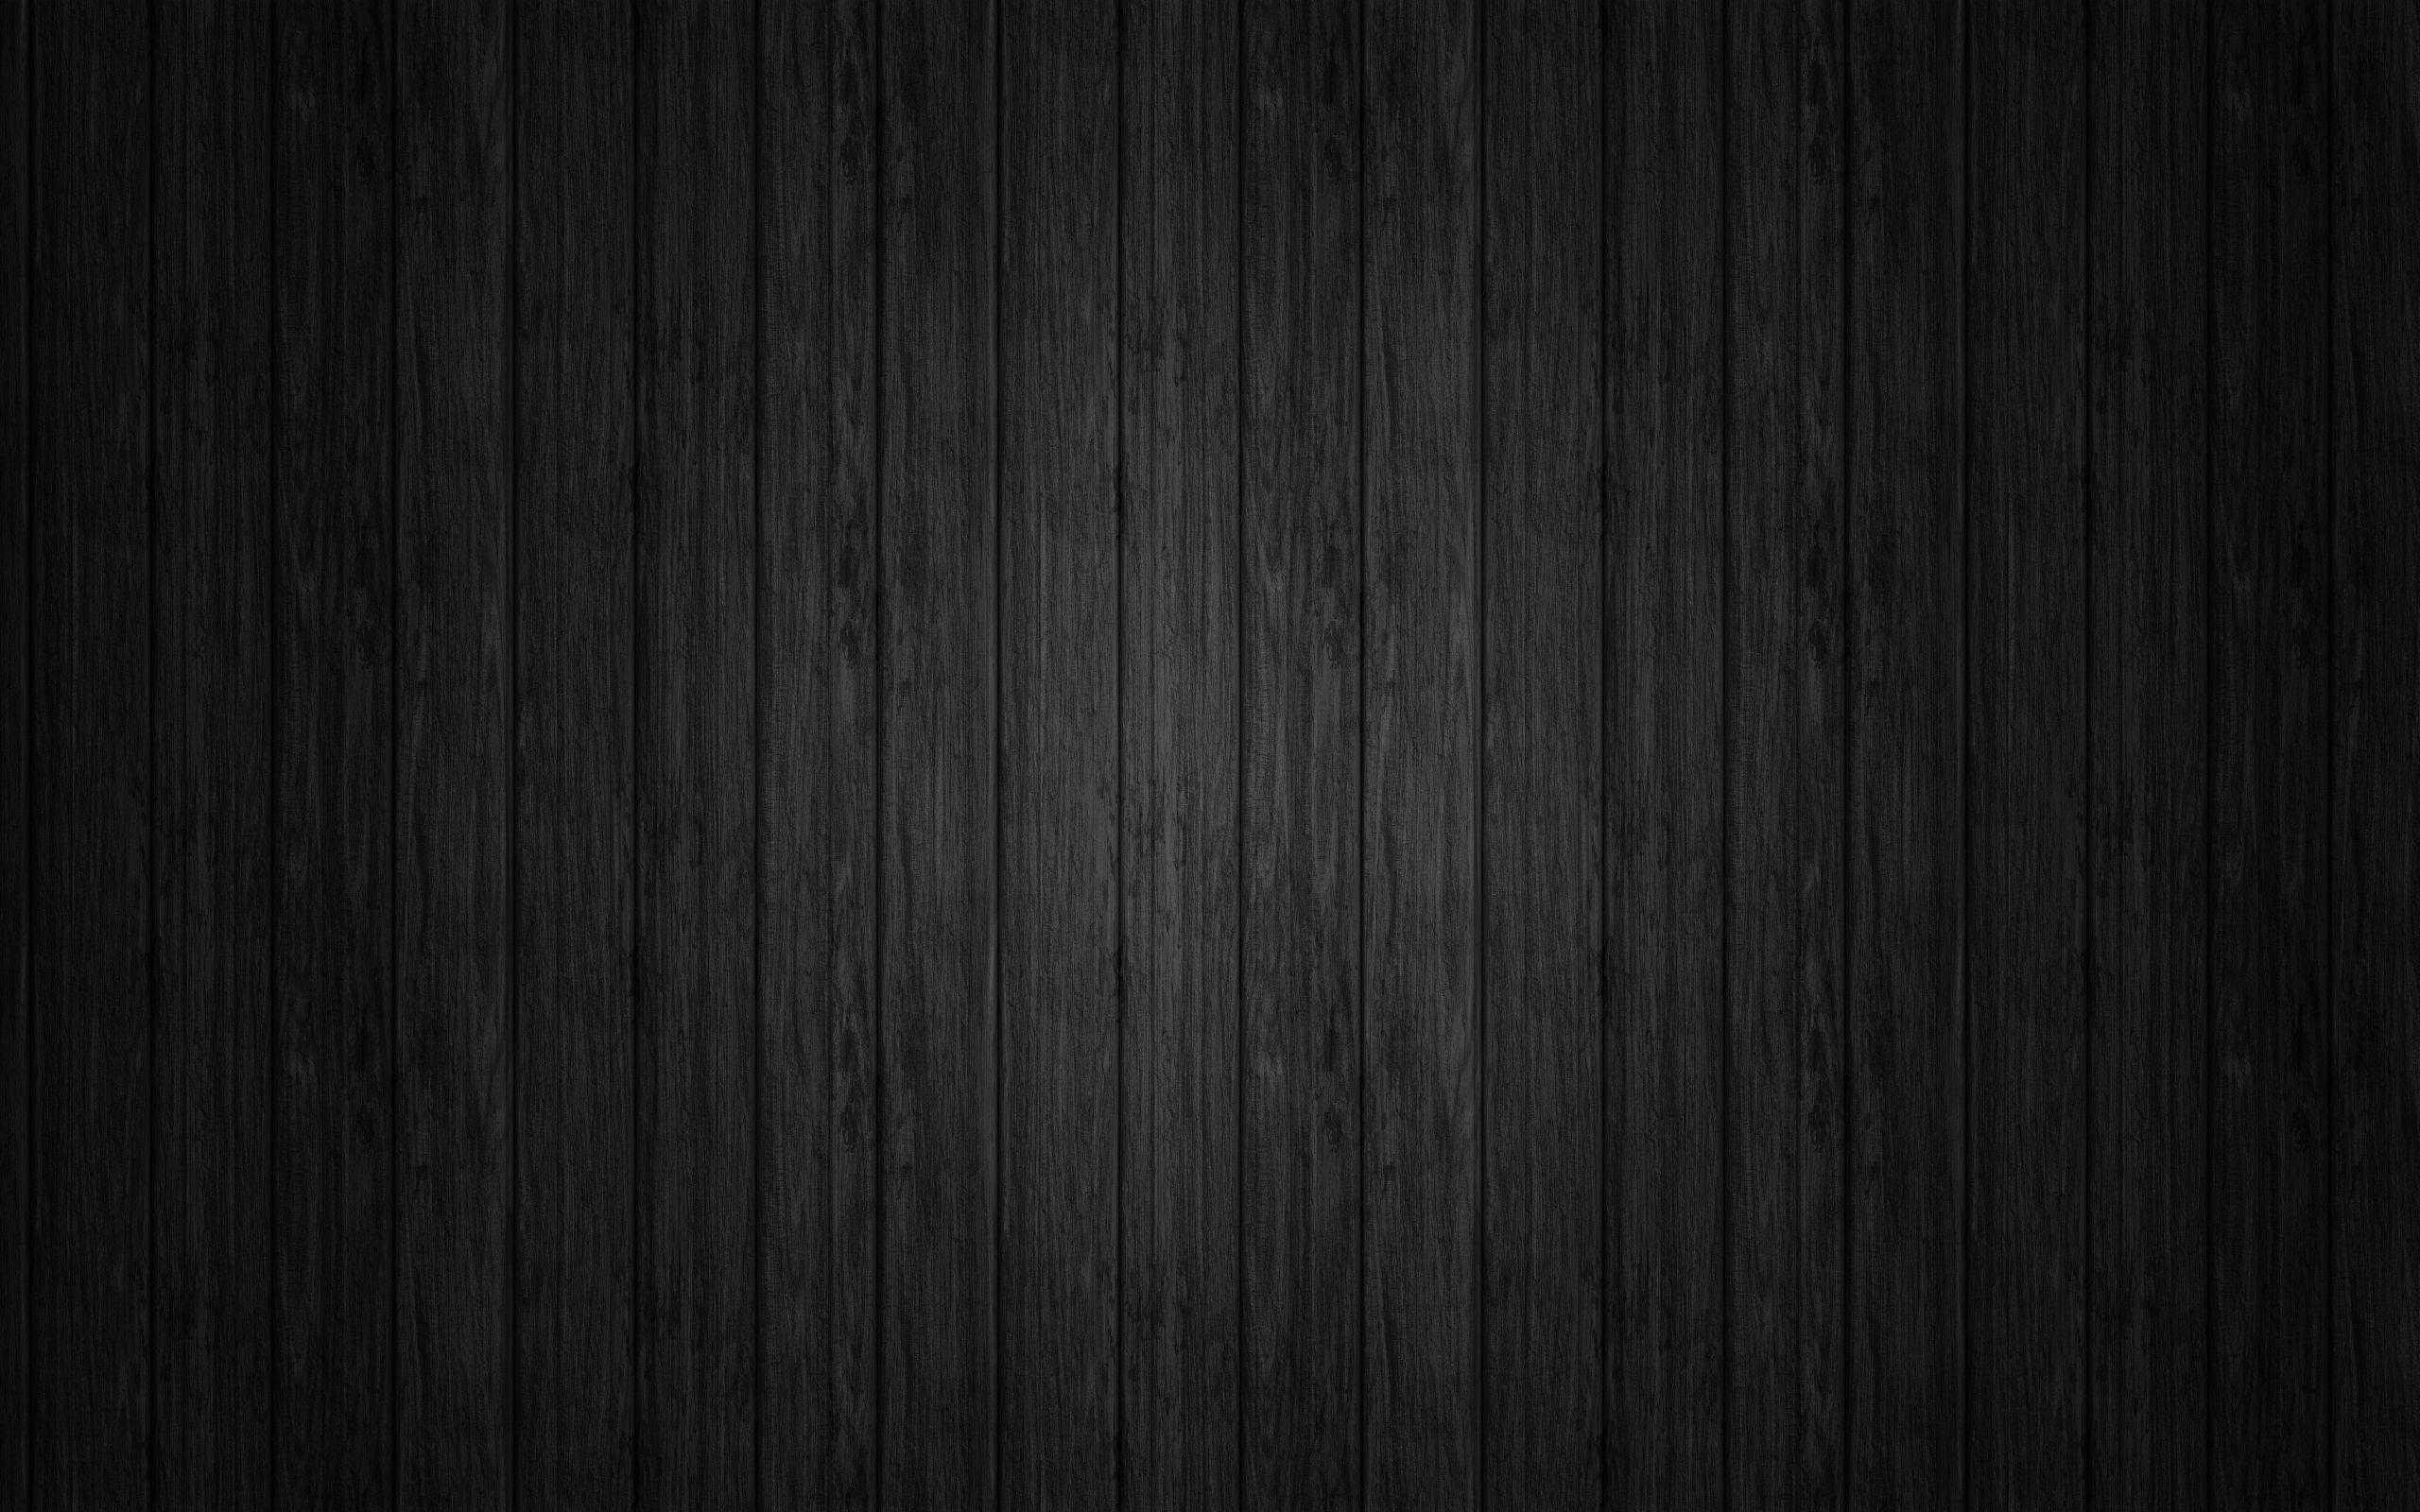 Plain Black Wallpaper Large Hd Wallpaper Database Dark